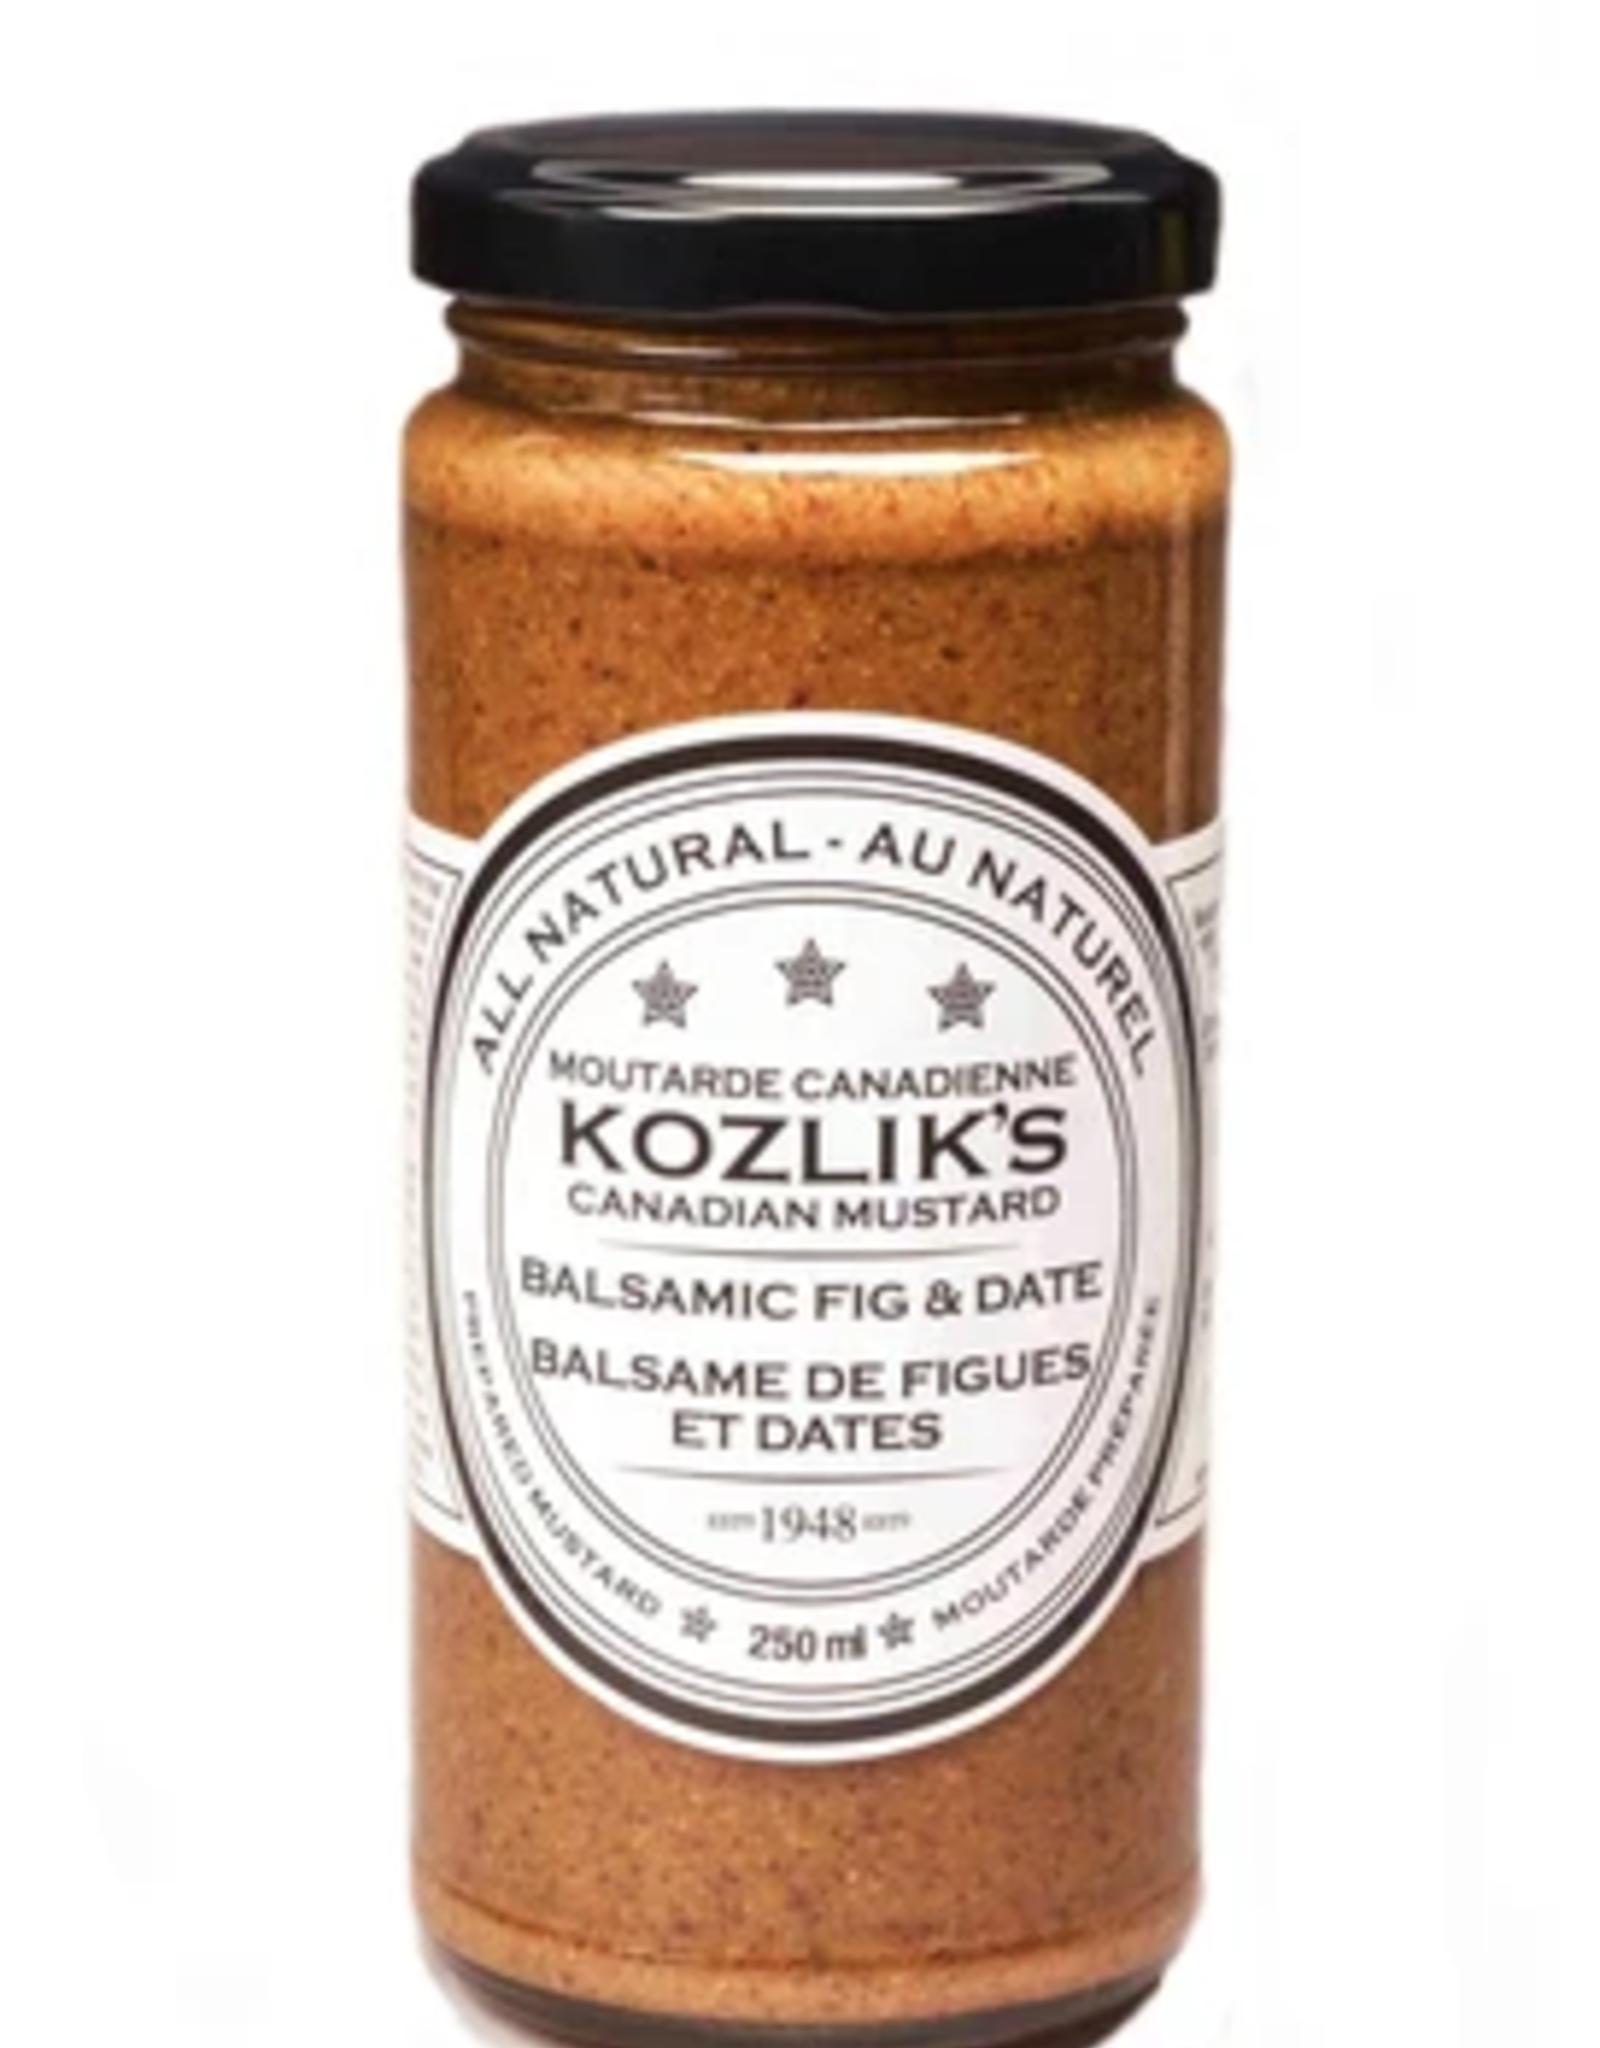 Kozlik's Balsamic Fig & Dates Mustard